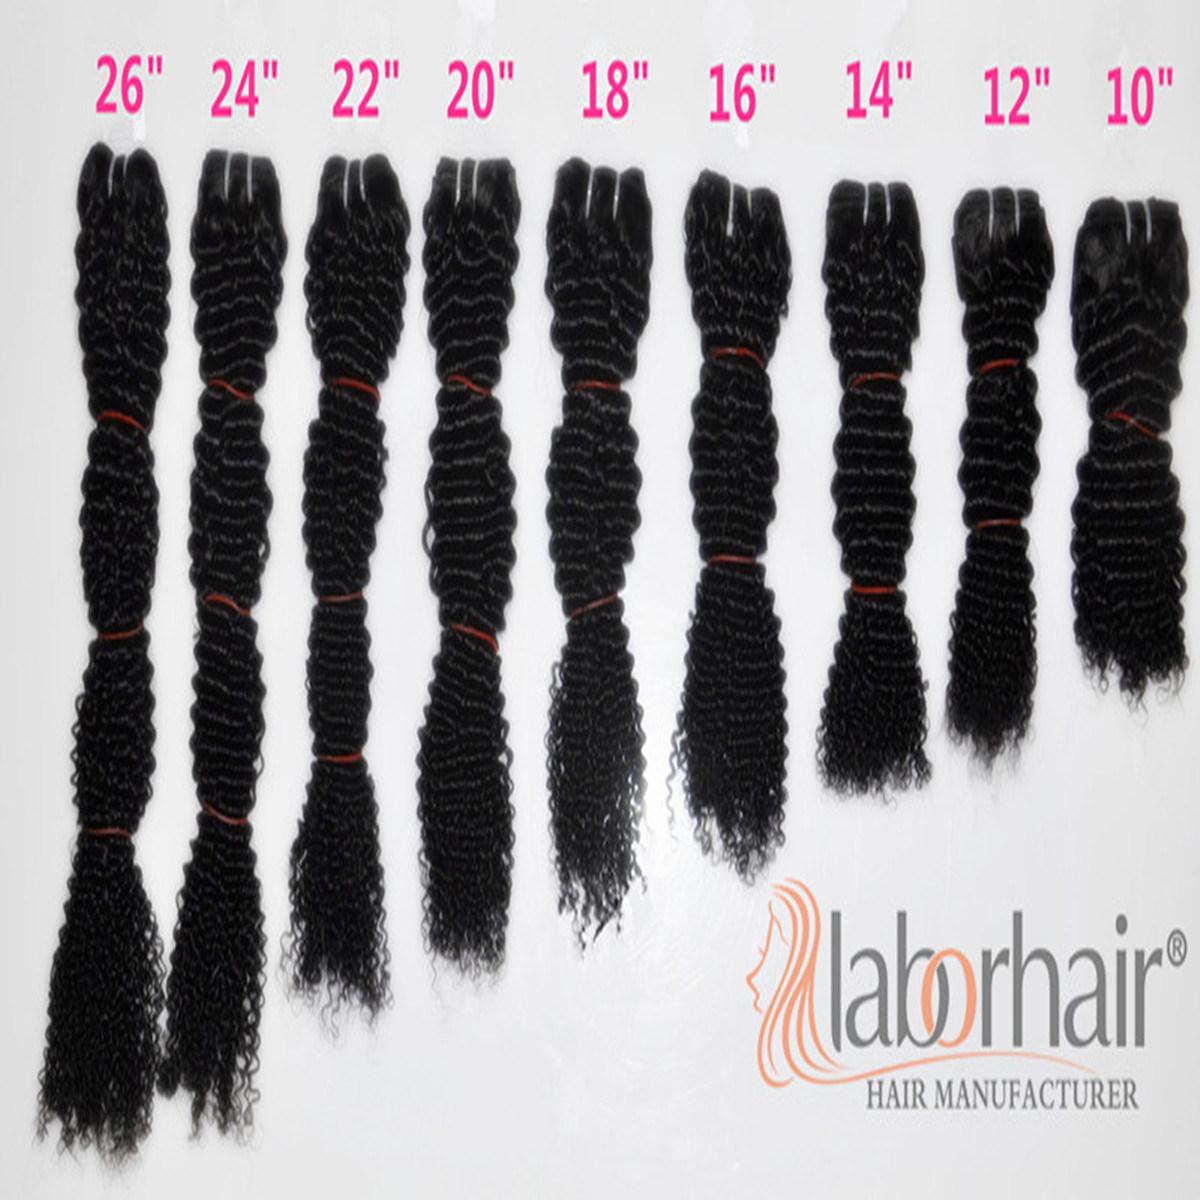 Labor Hair Products Brazilian Hair Weave Bundles Kinky Curly Virgin Hair 105g, Top Human Hair Extension Bundles